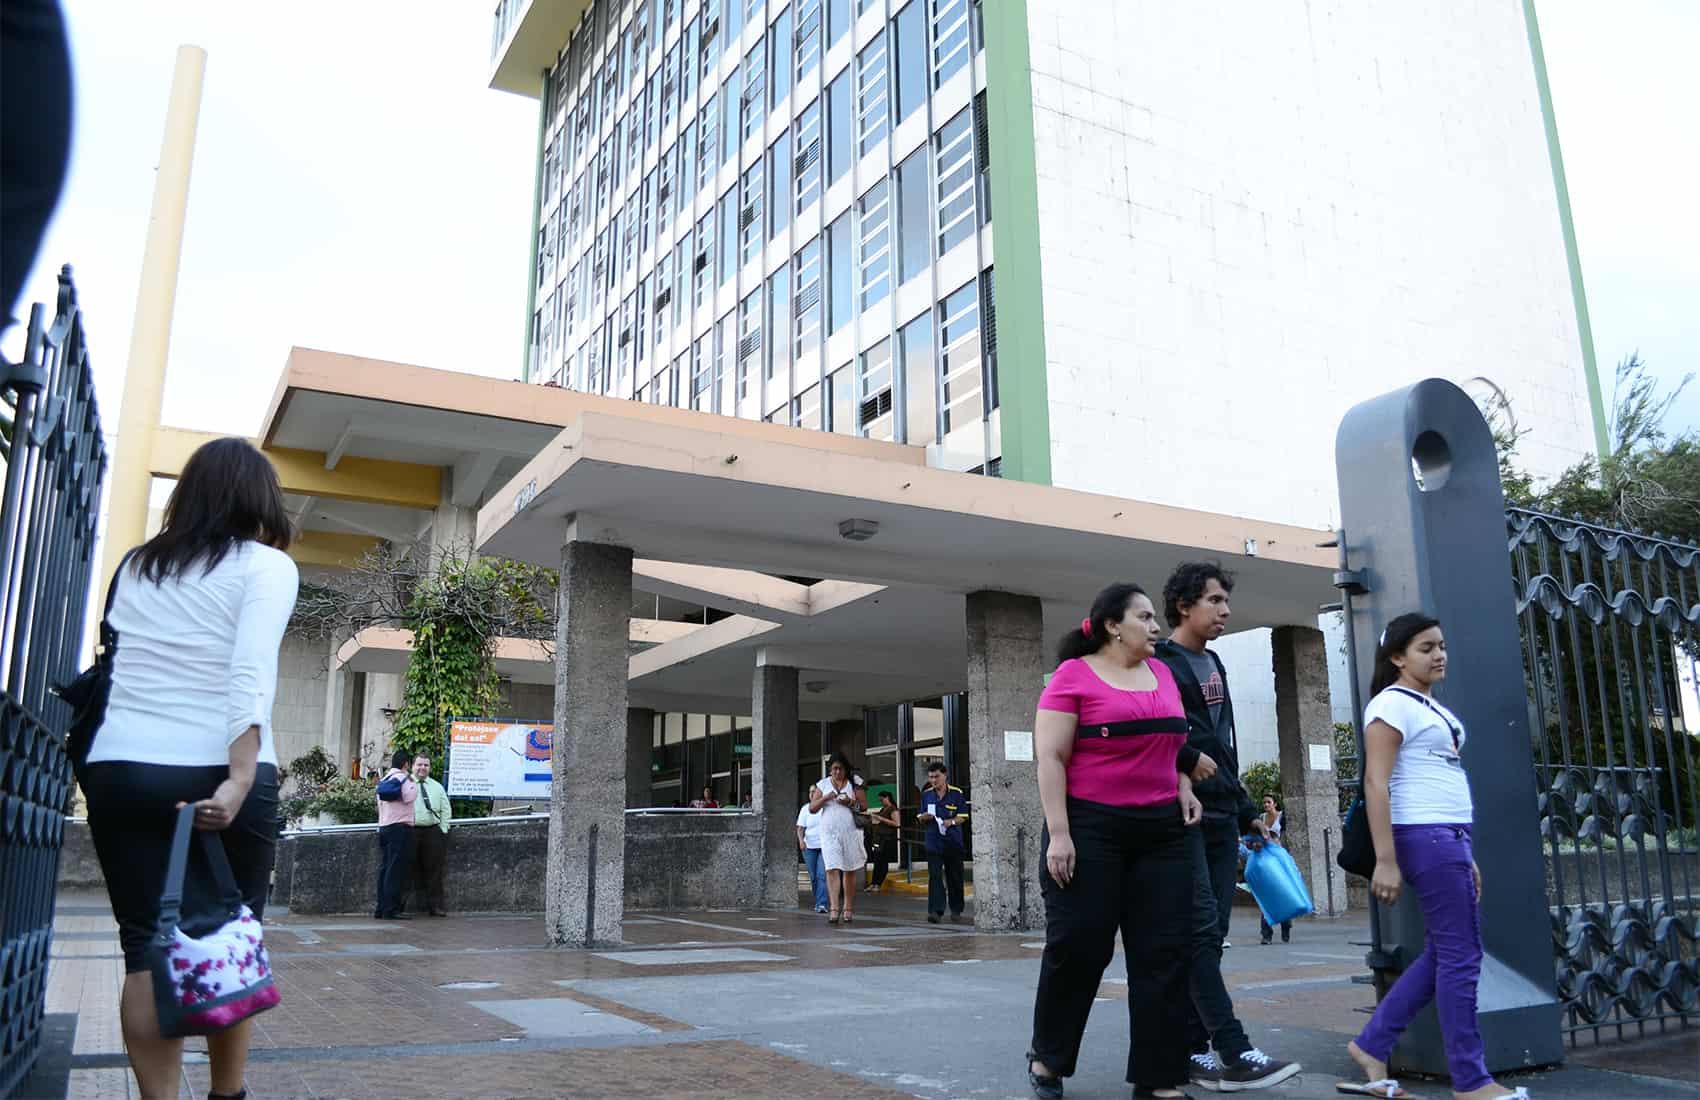 Caja building in San José